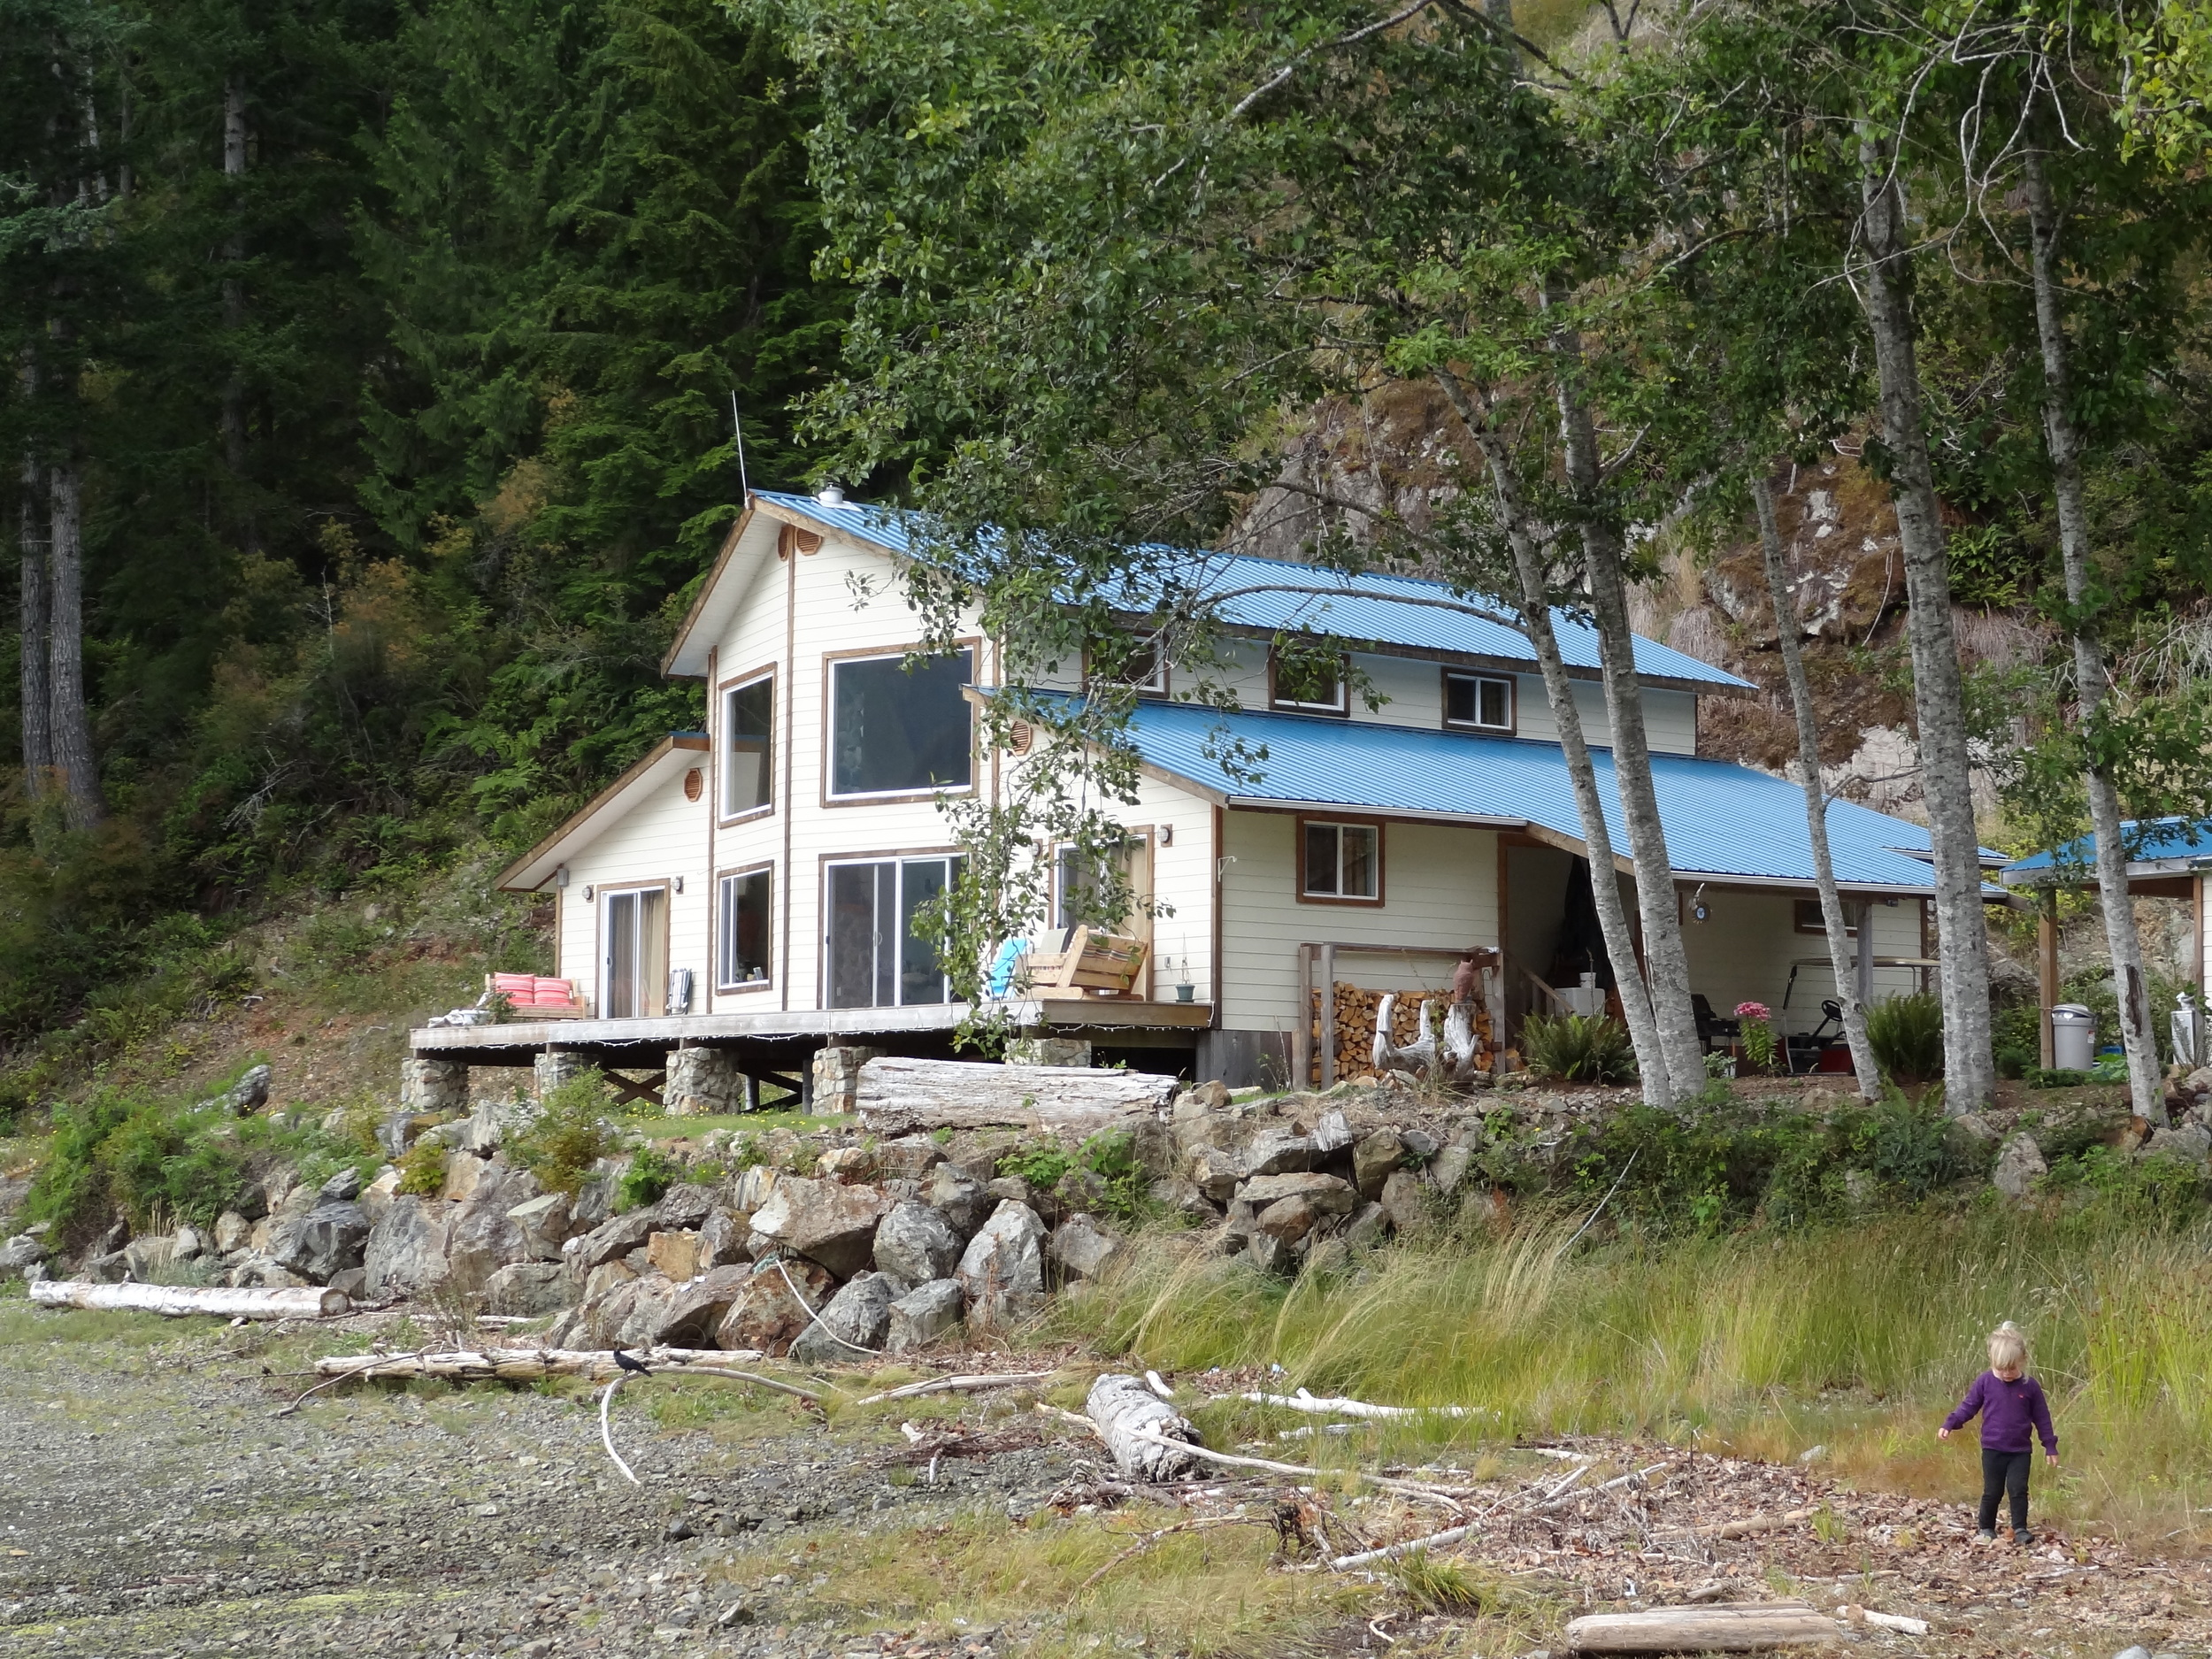 Morningside Lodge